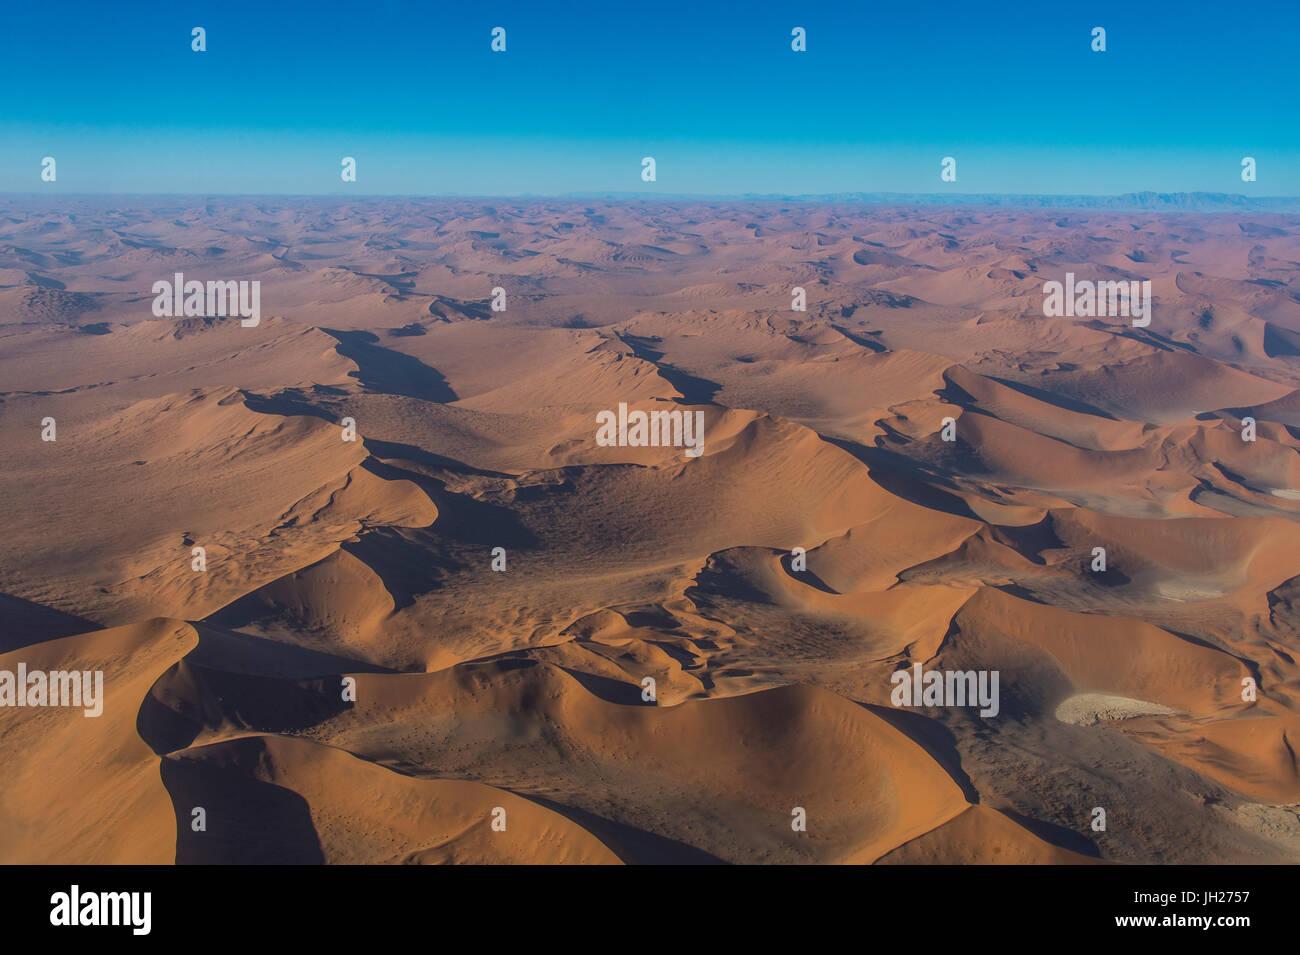 Aerial of the Namib Desert, Namibia, Africa - Stock Image